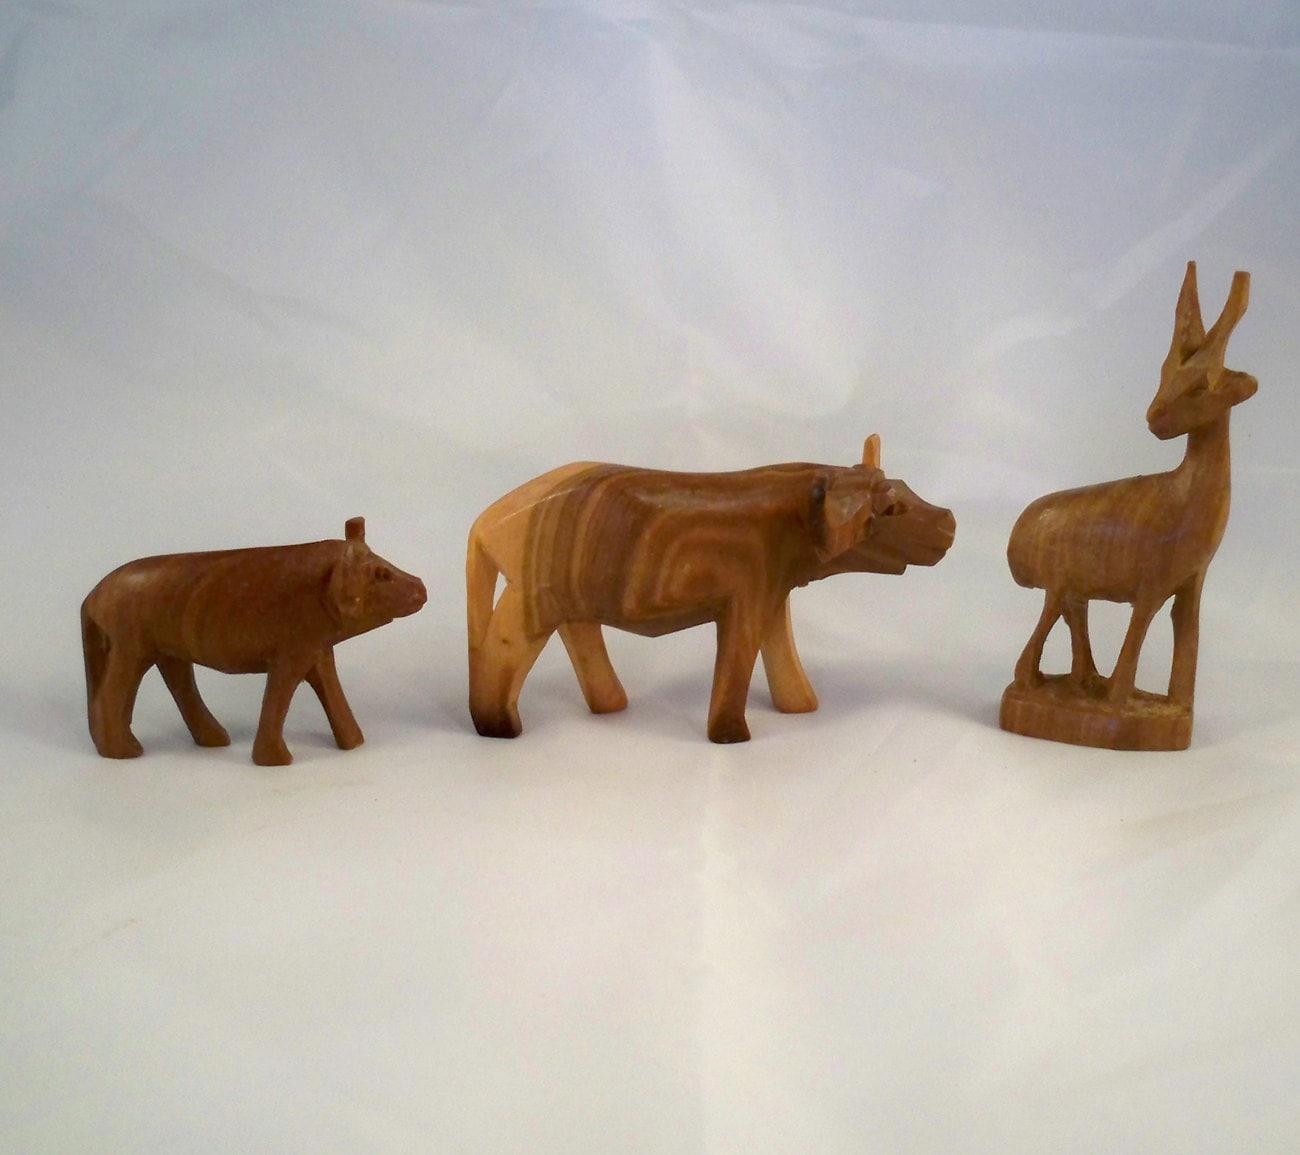 Wood sculpture animals images